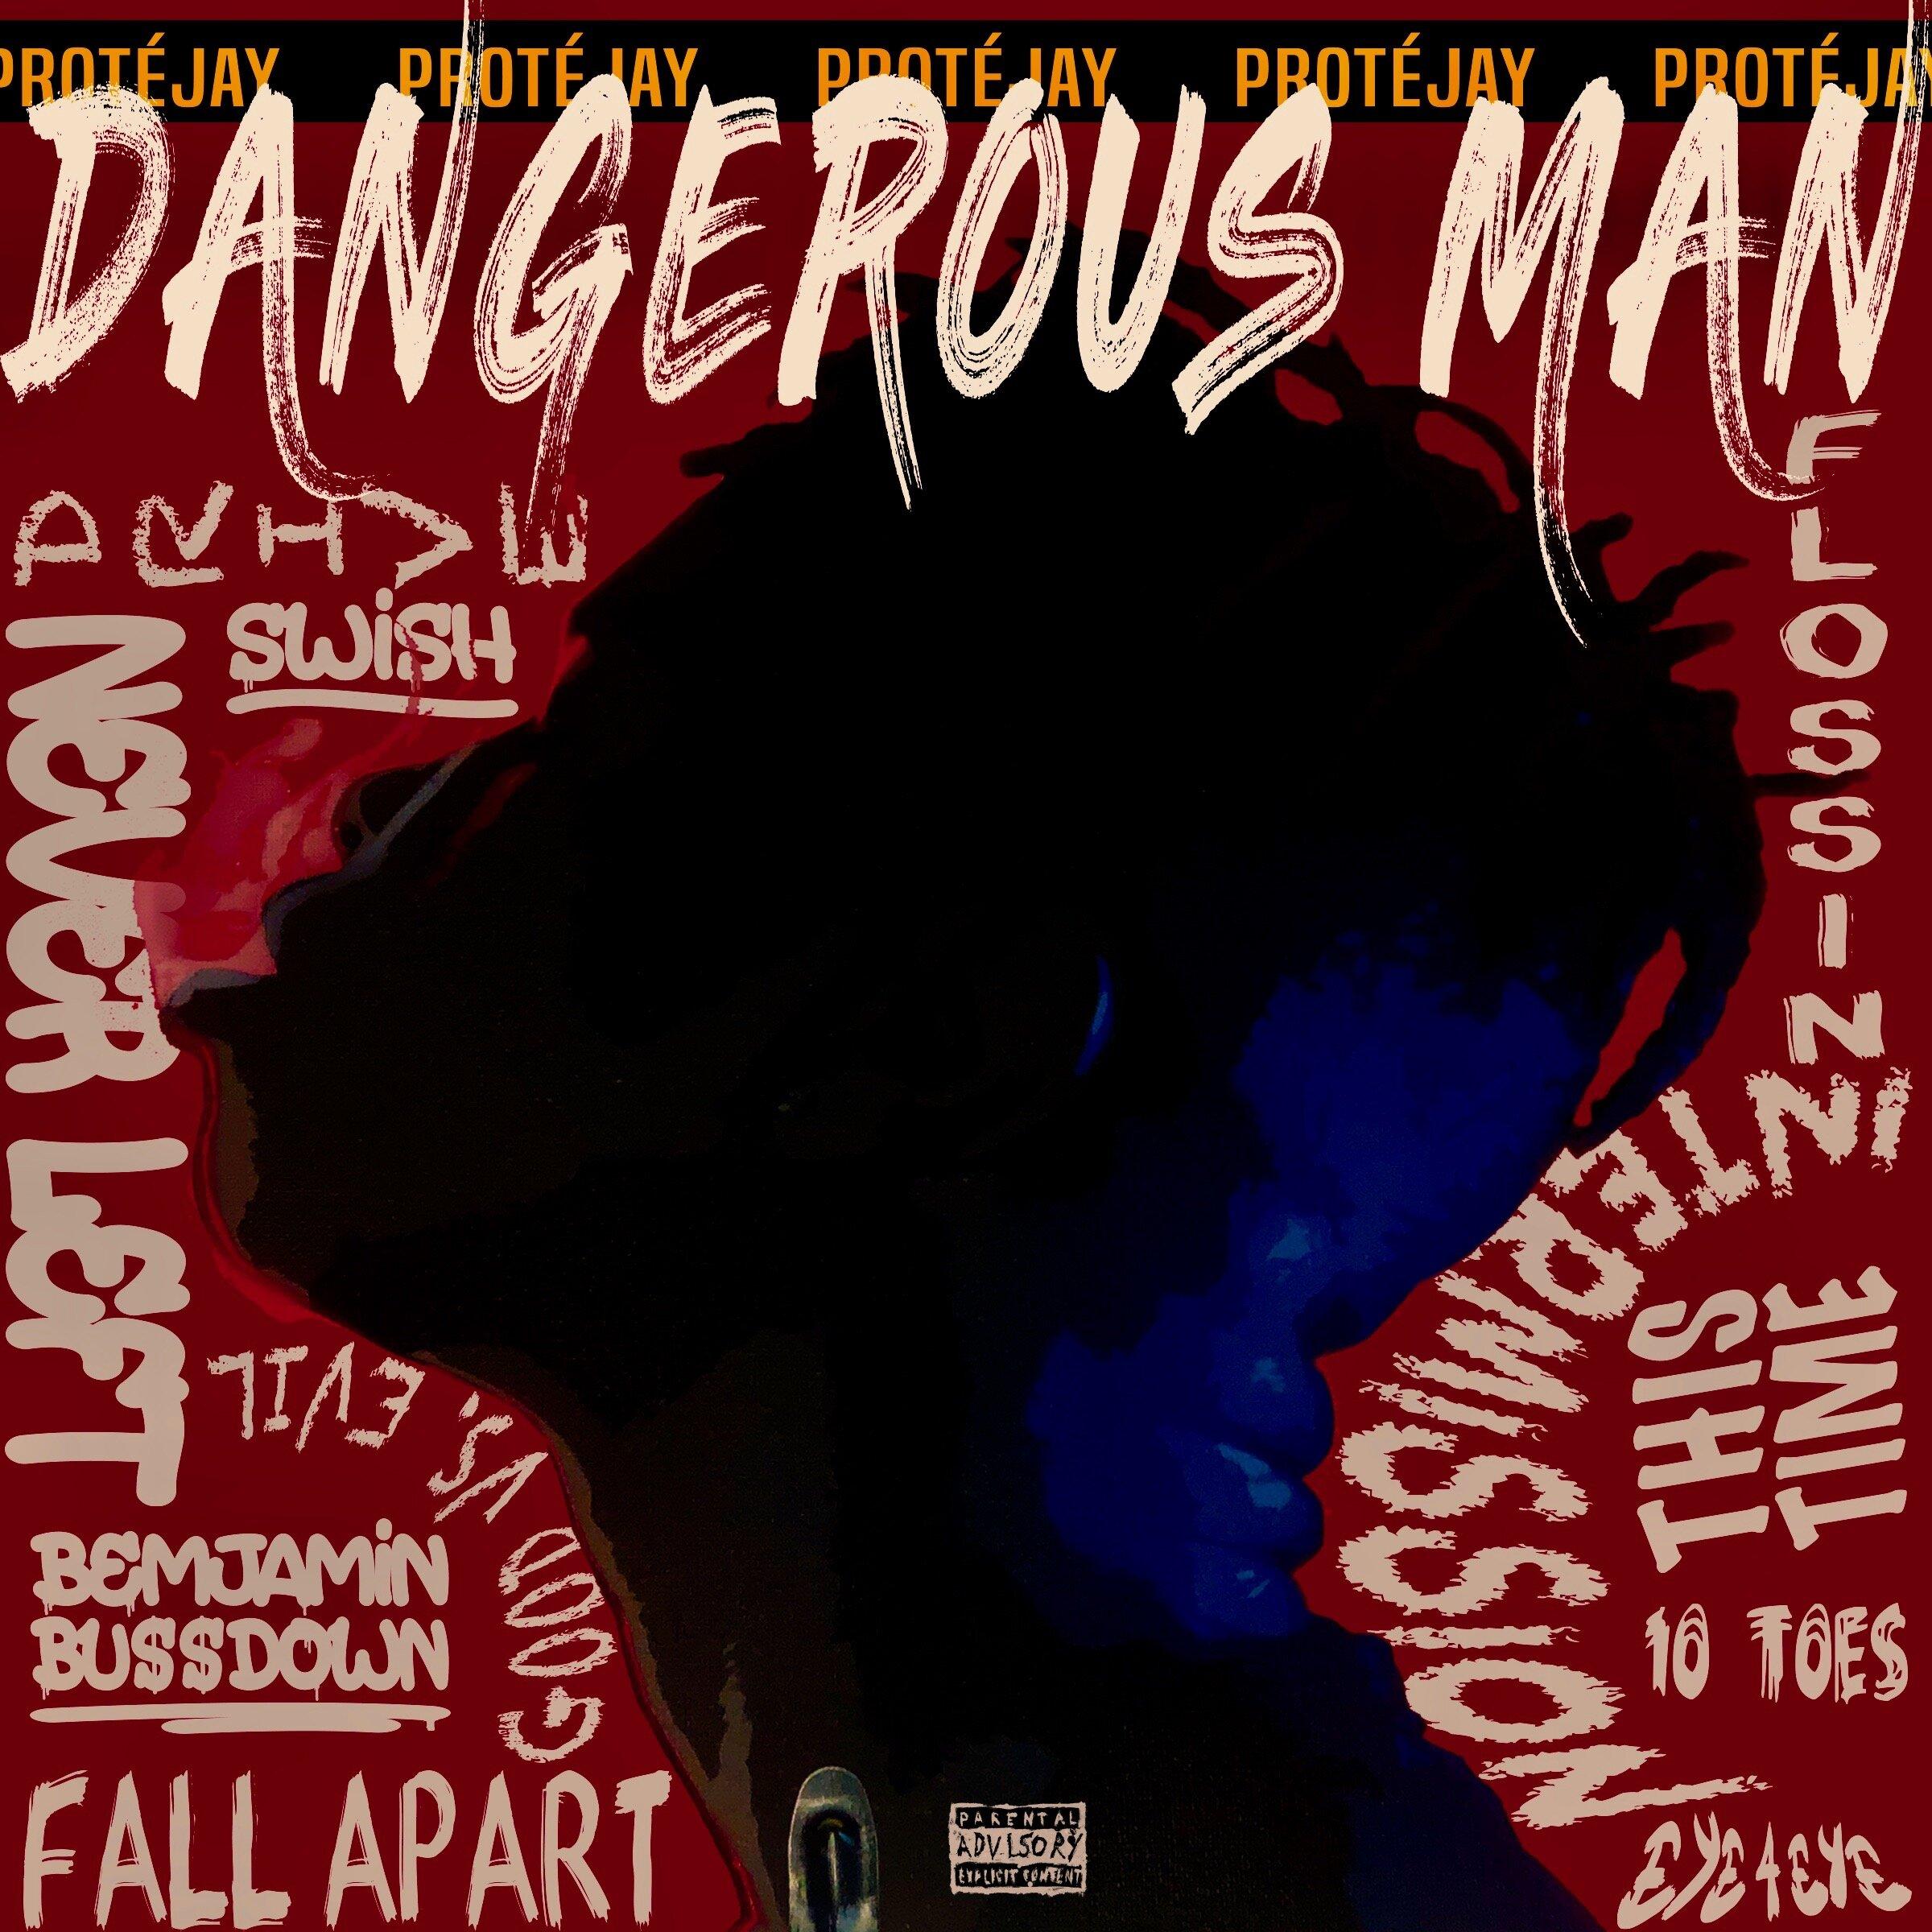 ProteJay - Dangerous Man - FRONT ALBUM COVER.JPG